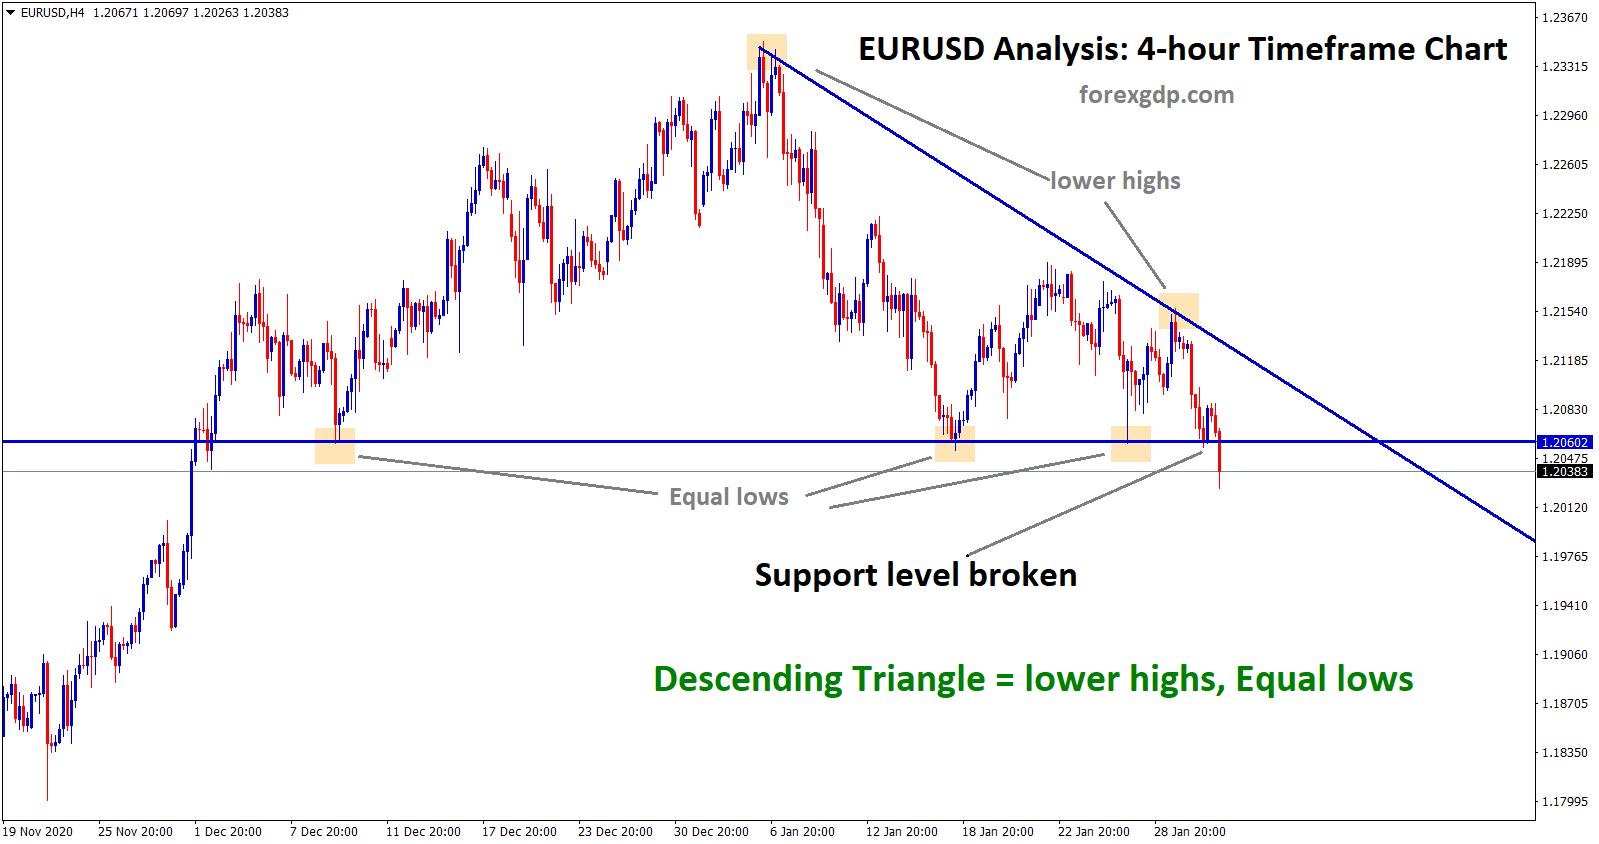 eurusd broken the support level of descending triangle pattern